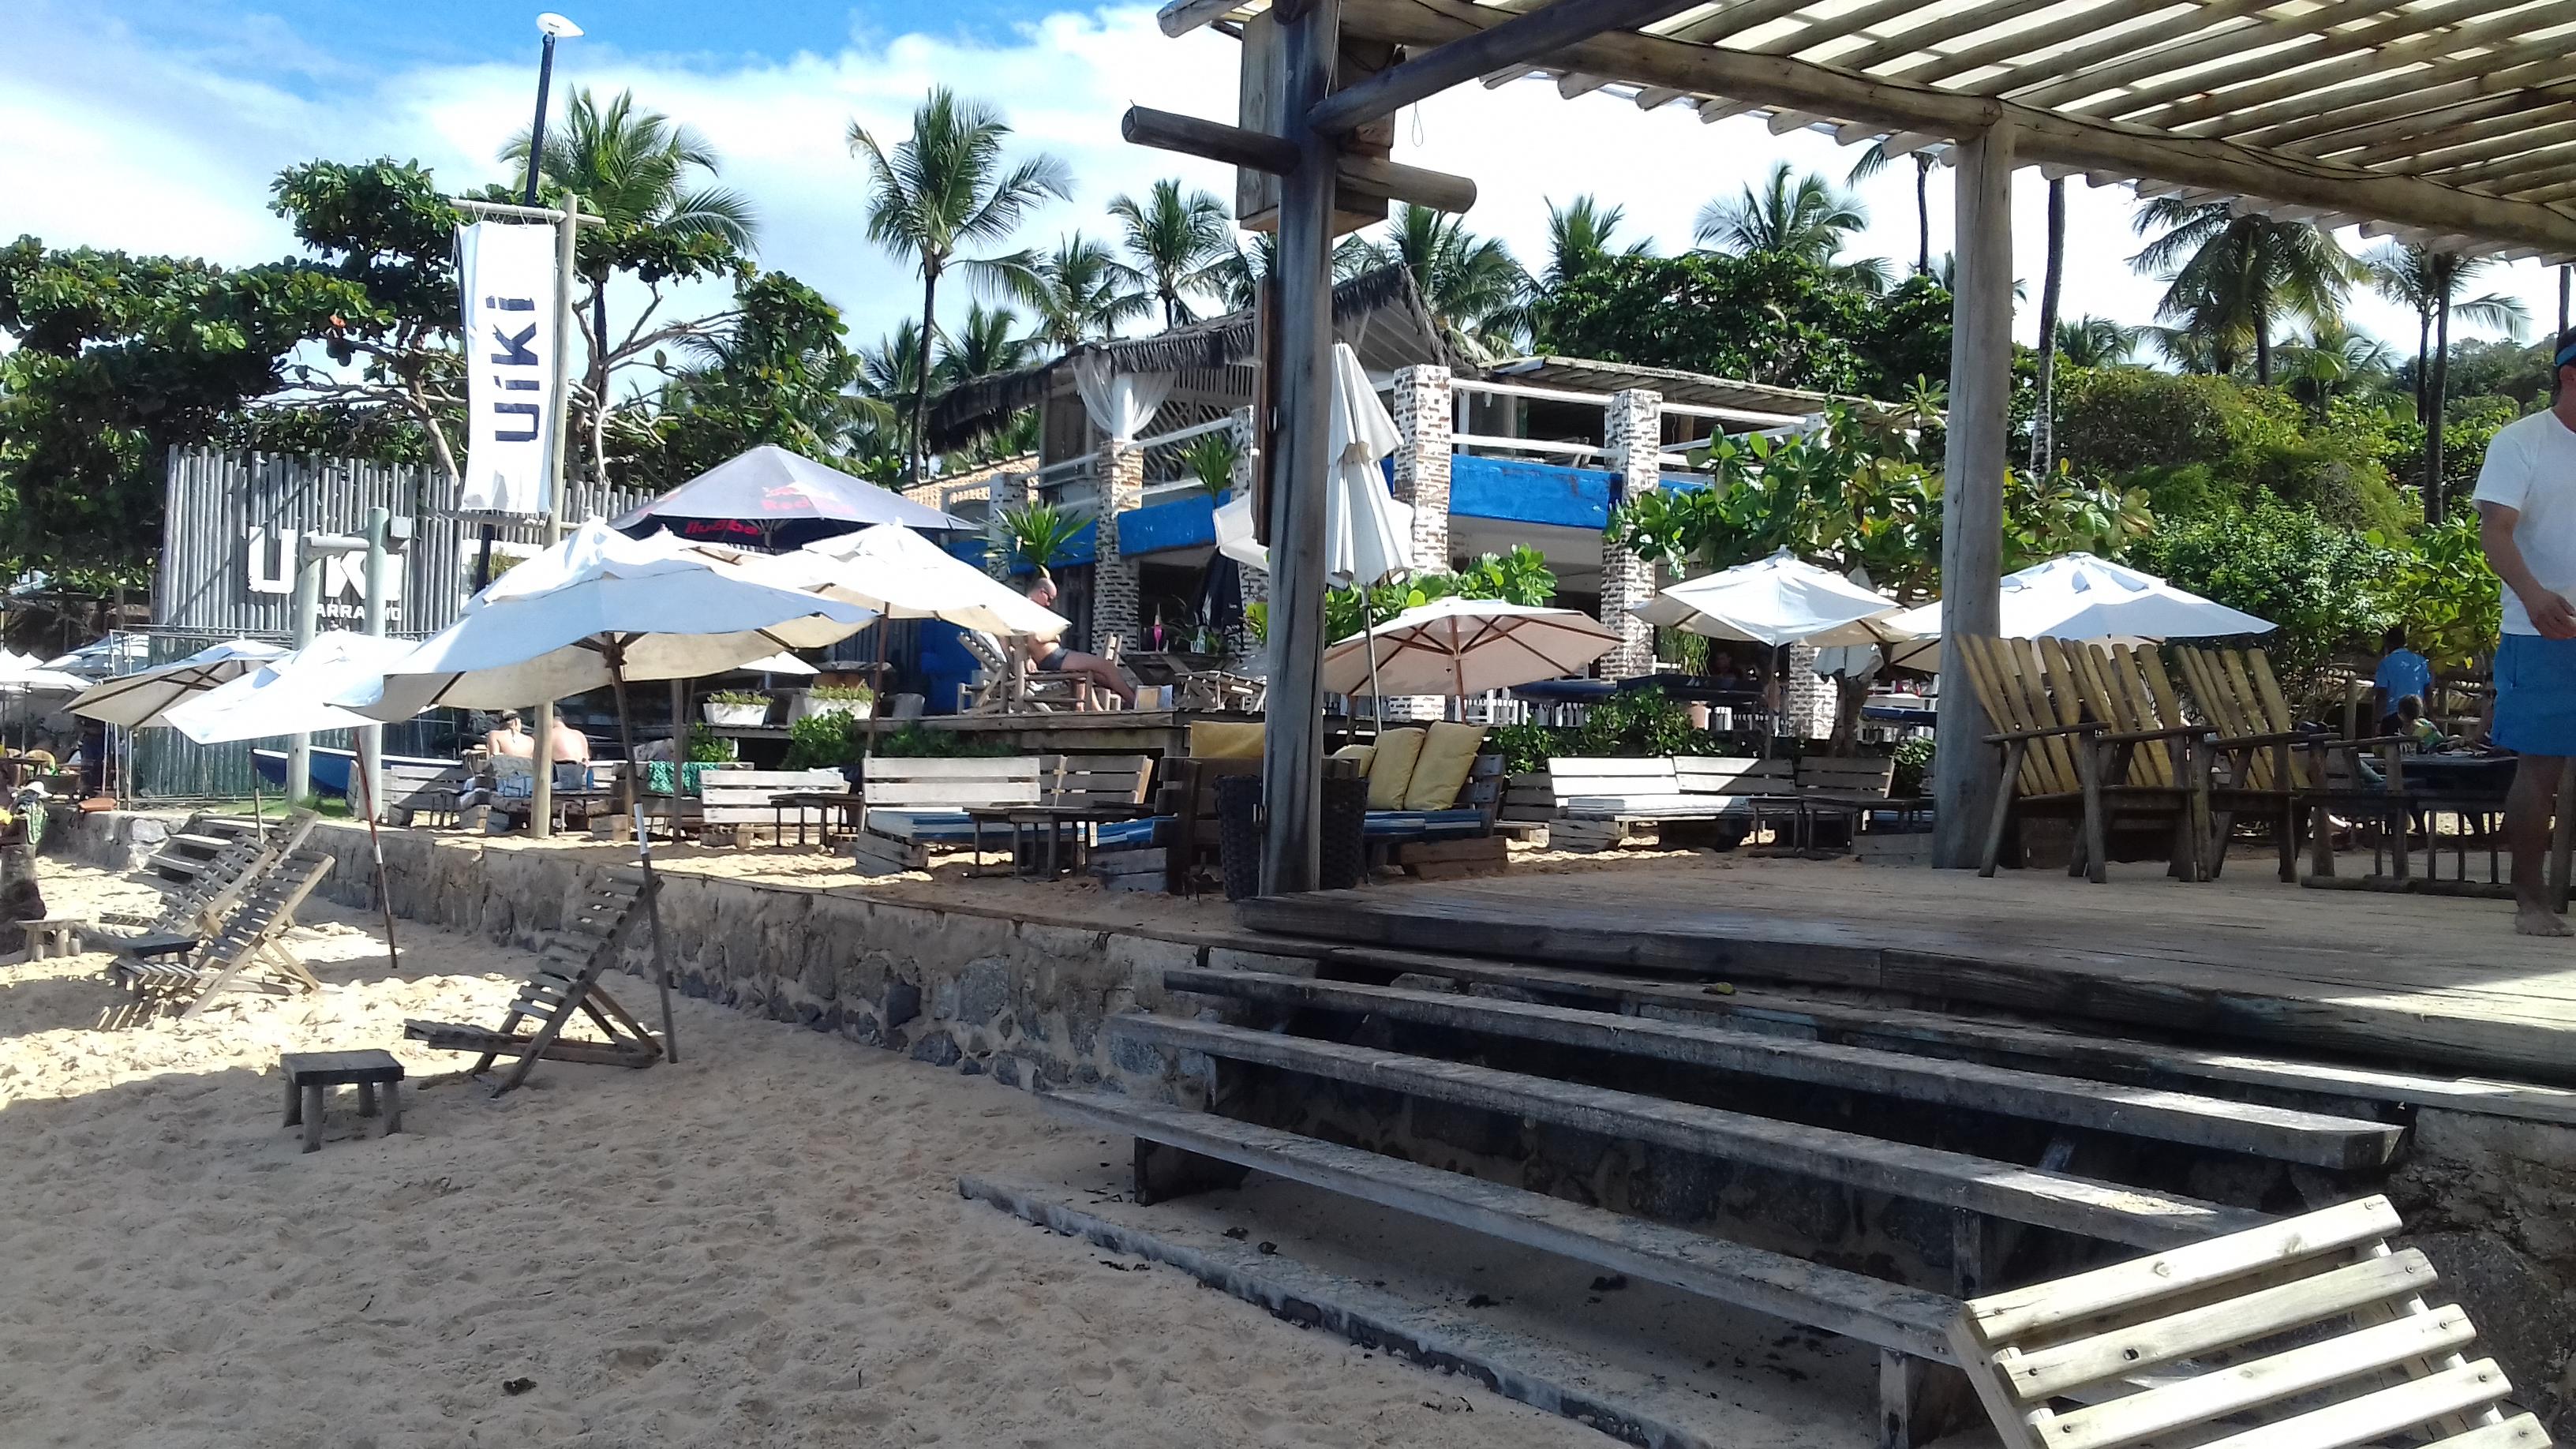 Barraca Uiki em Arraial d'Ajuda